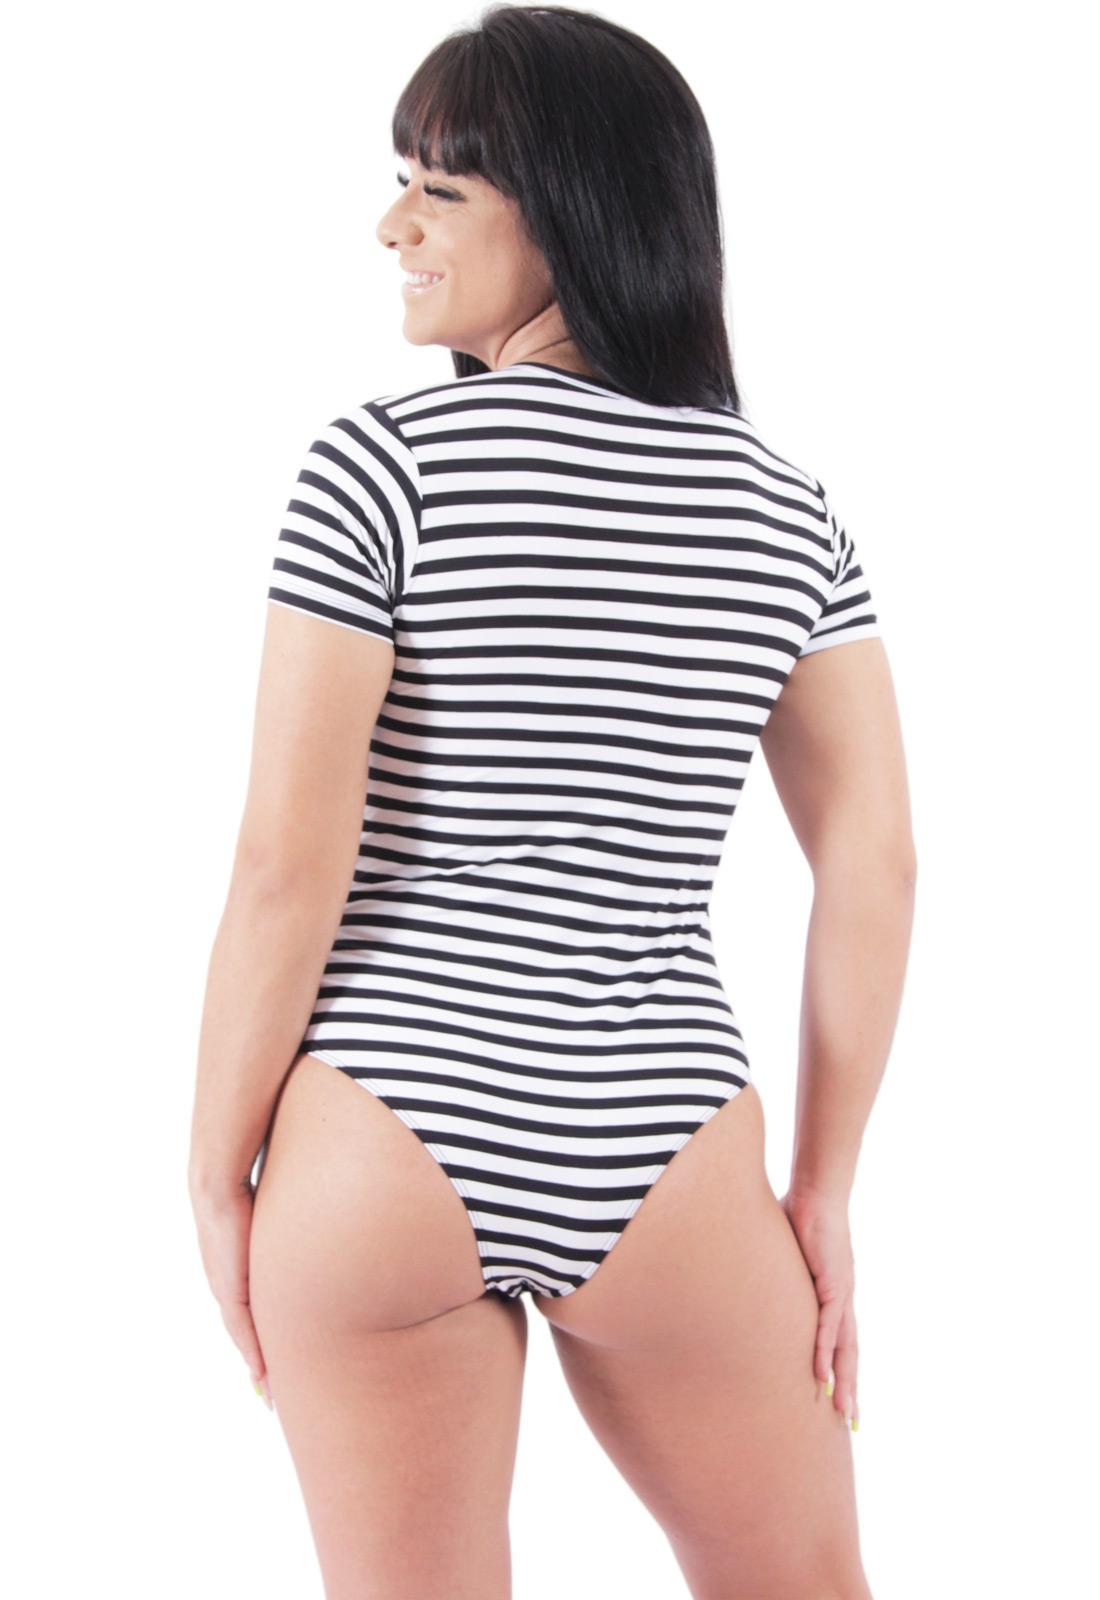 Body Feminino Collant Listrado Poliamida